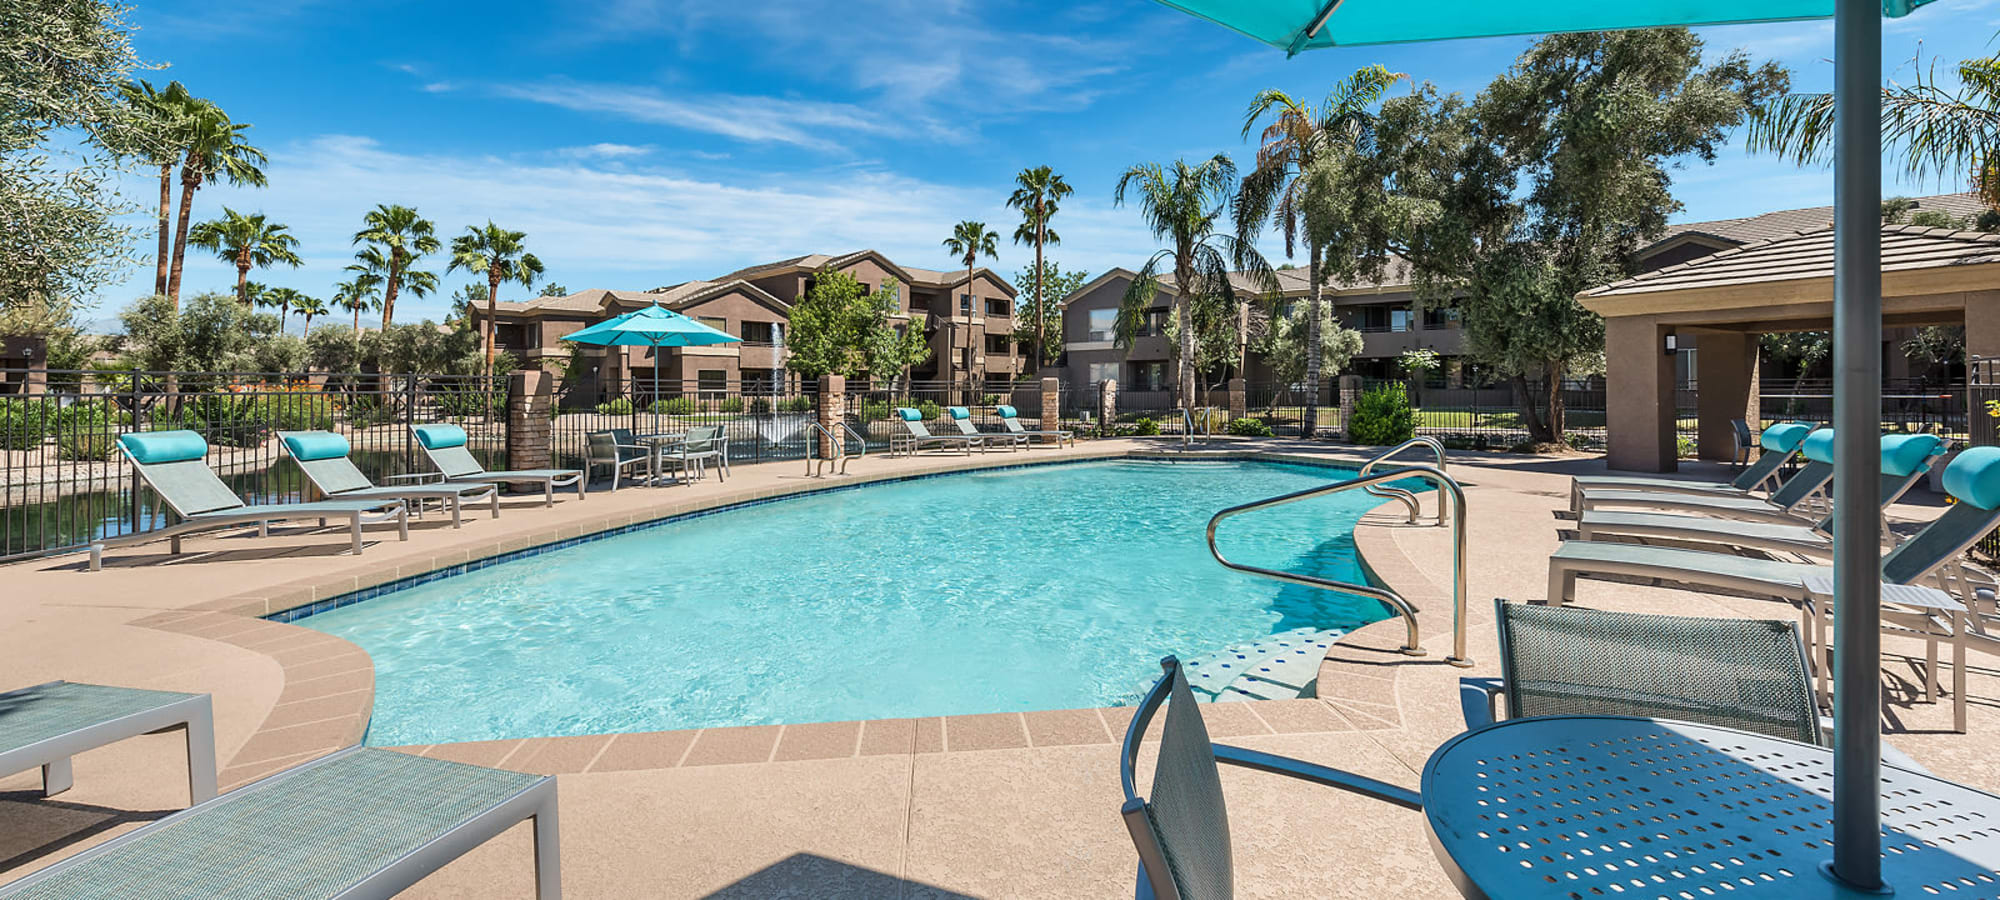 Spacious swimming pool at Laguna at Arrowhead Ranch in Glendale, Arizona